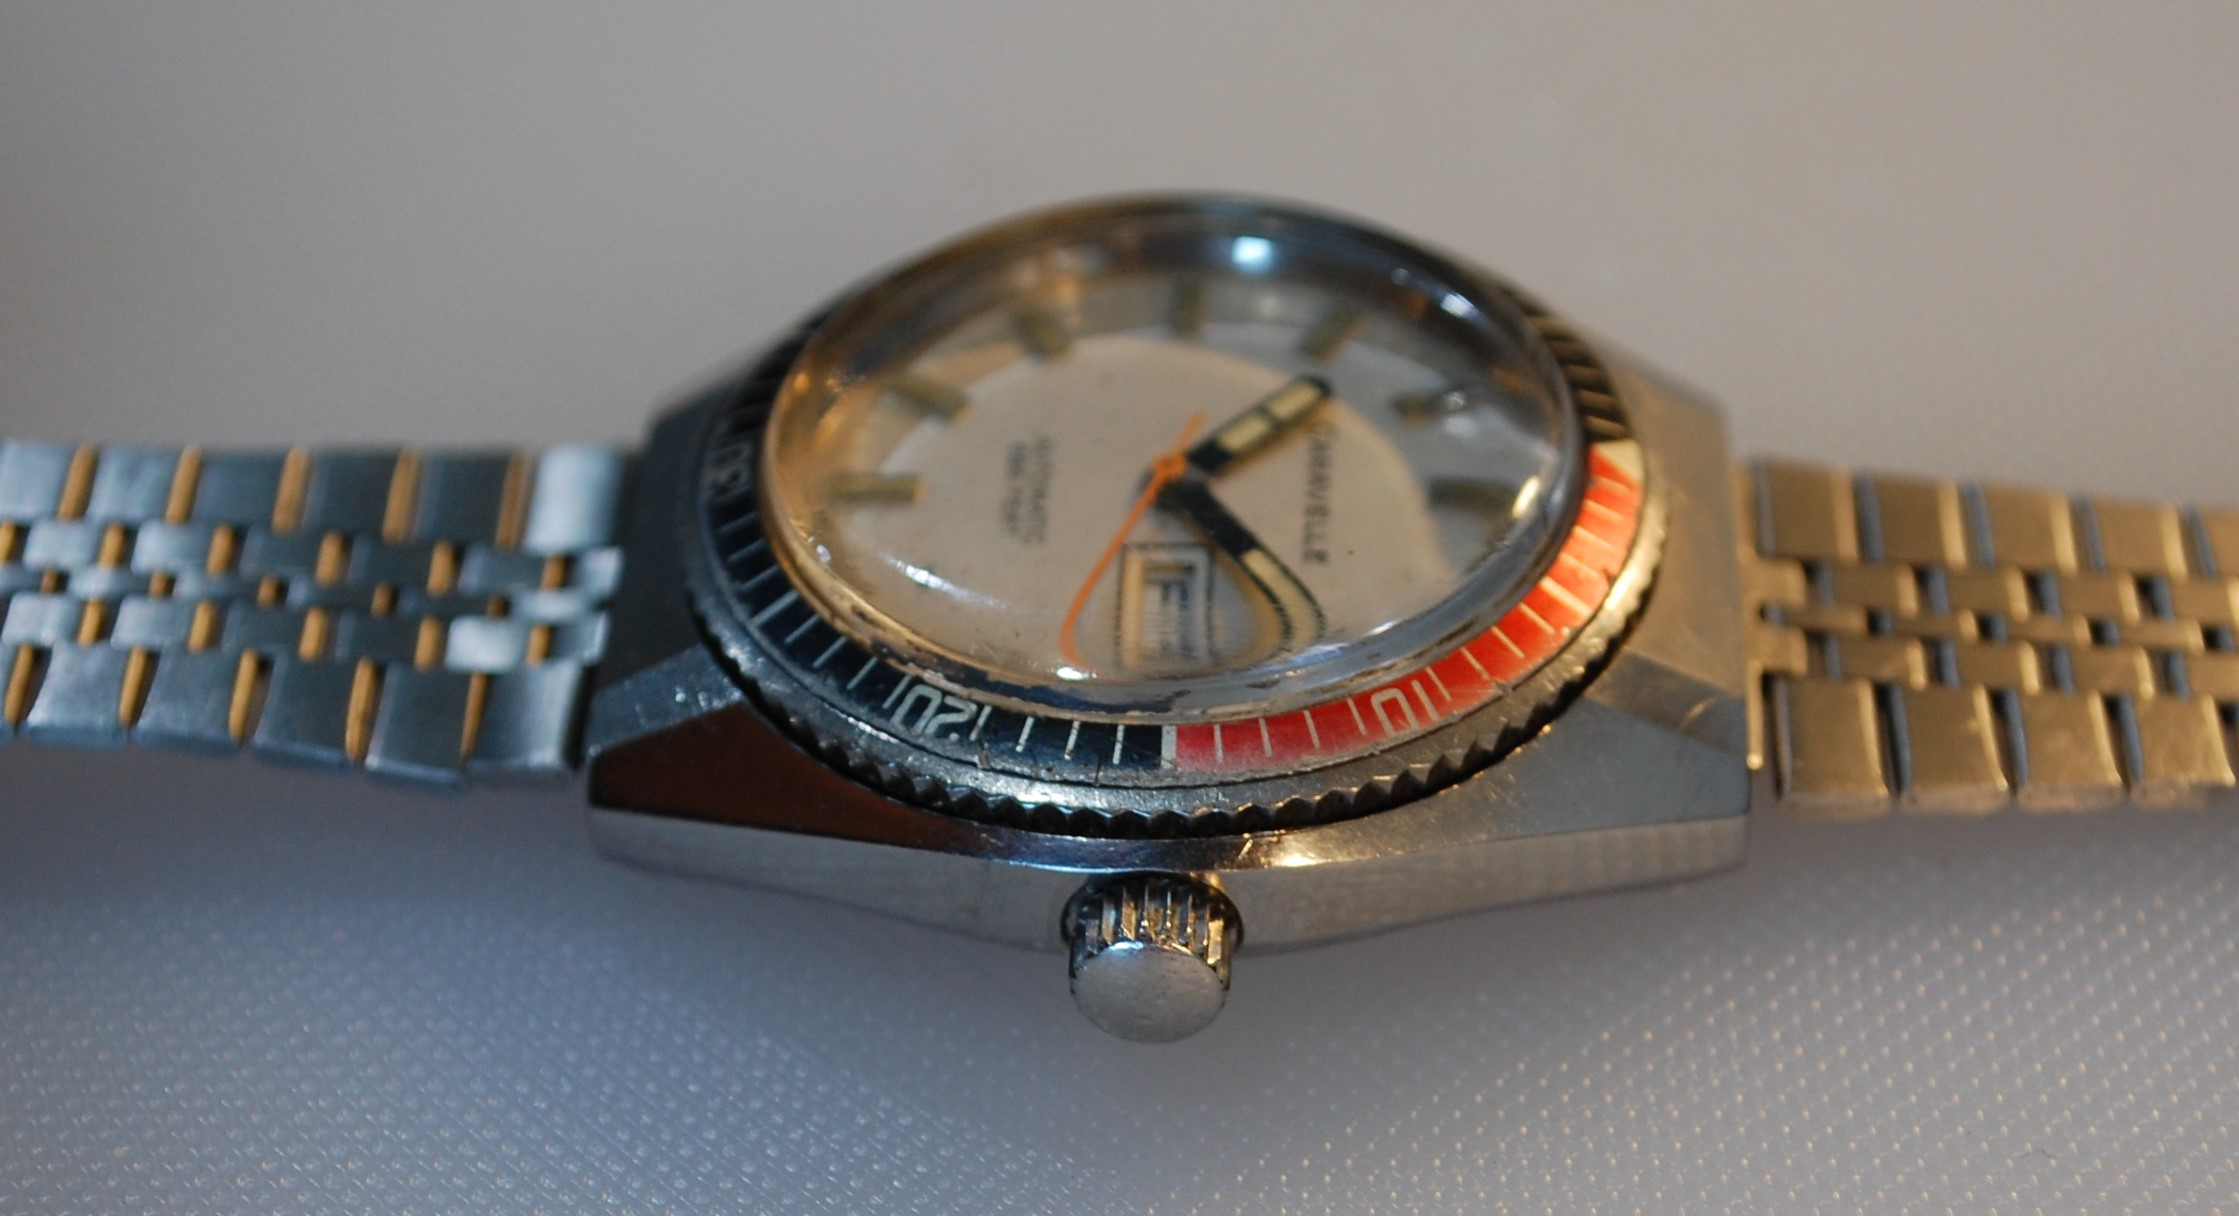 caravelle watch diver | eBay